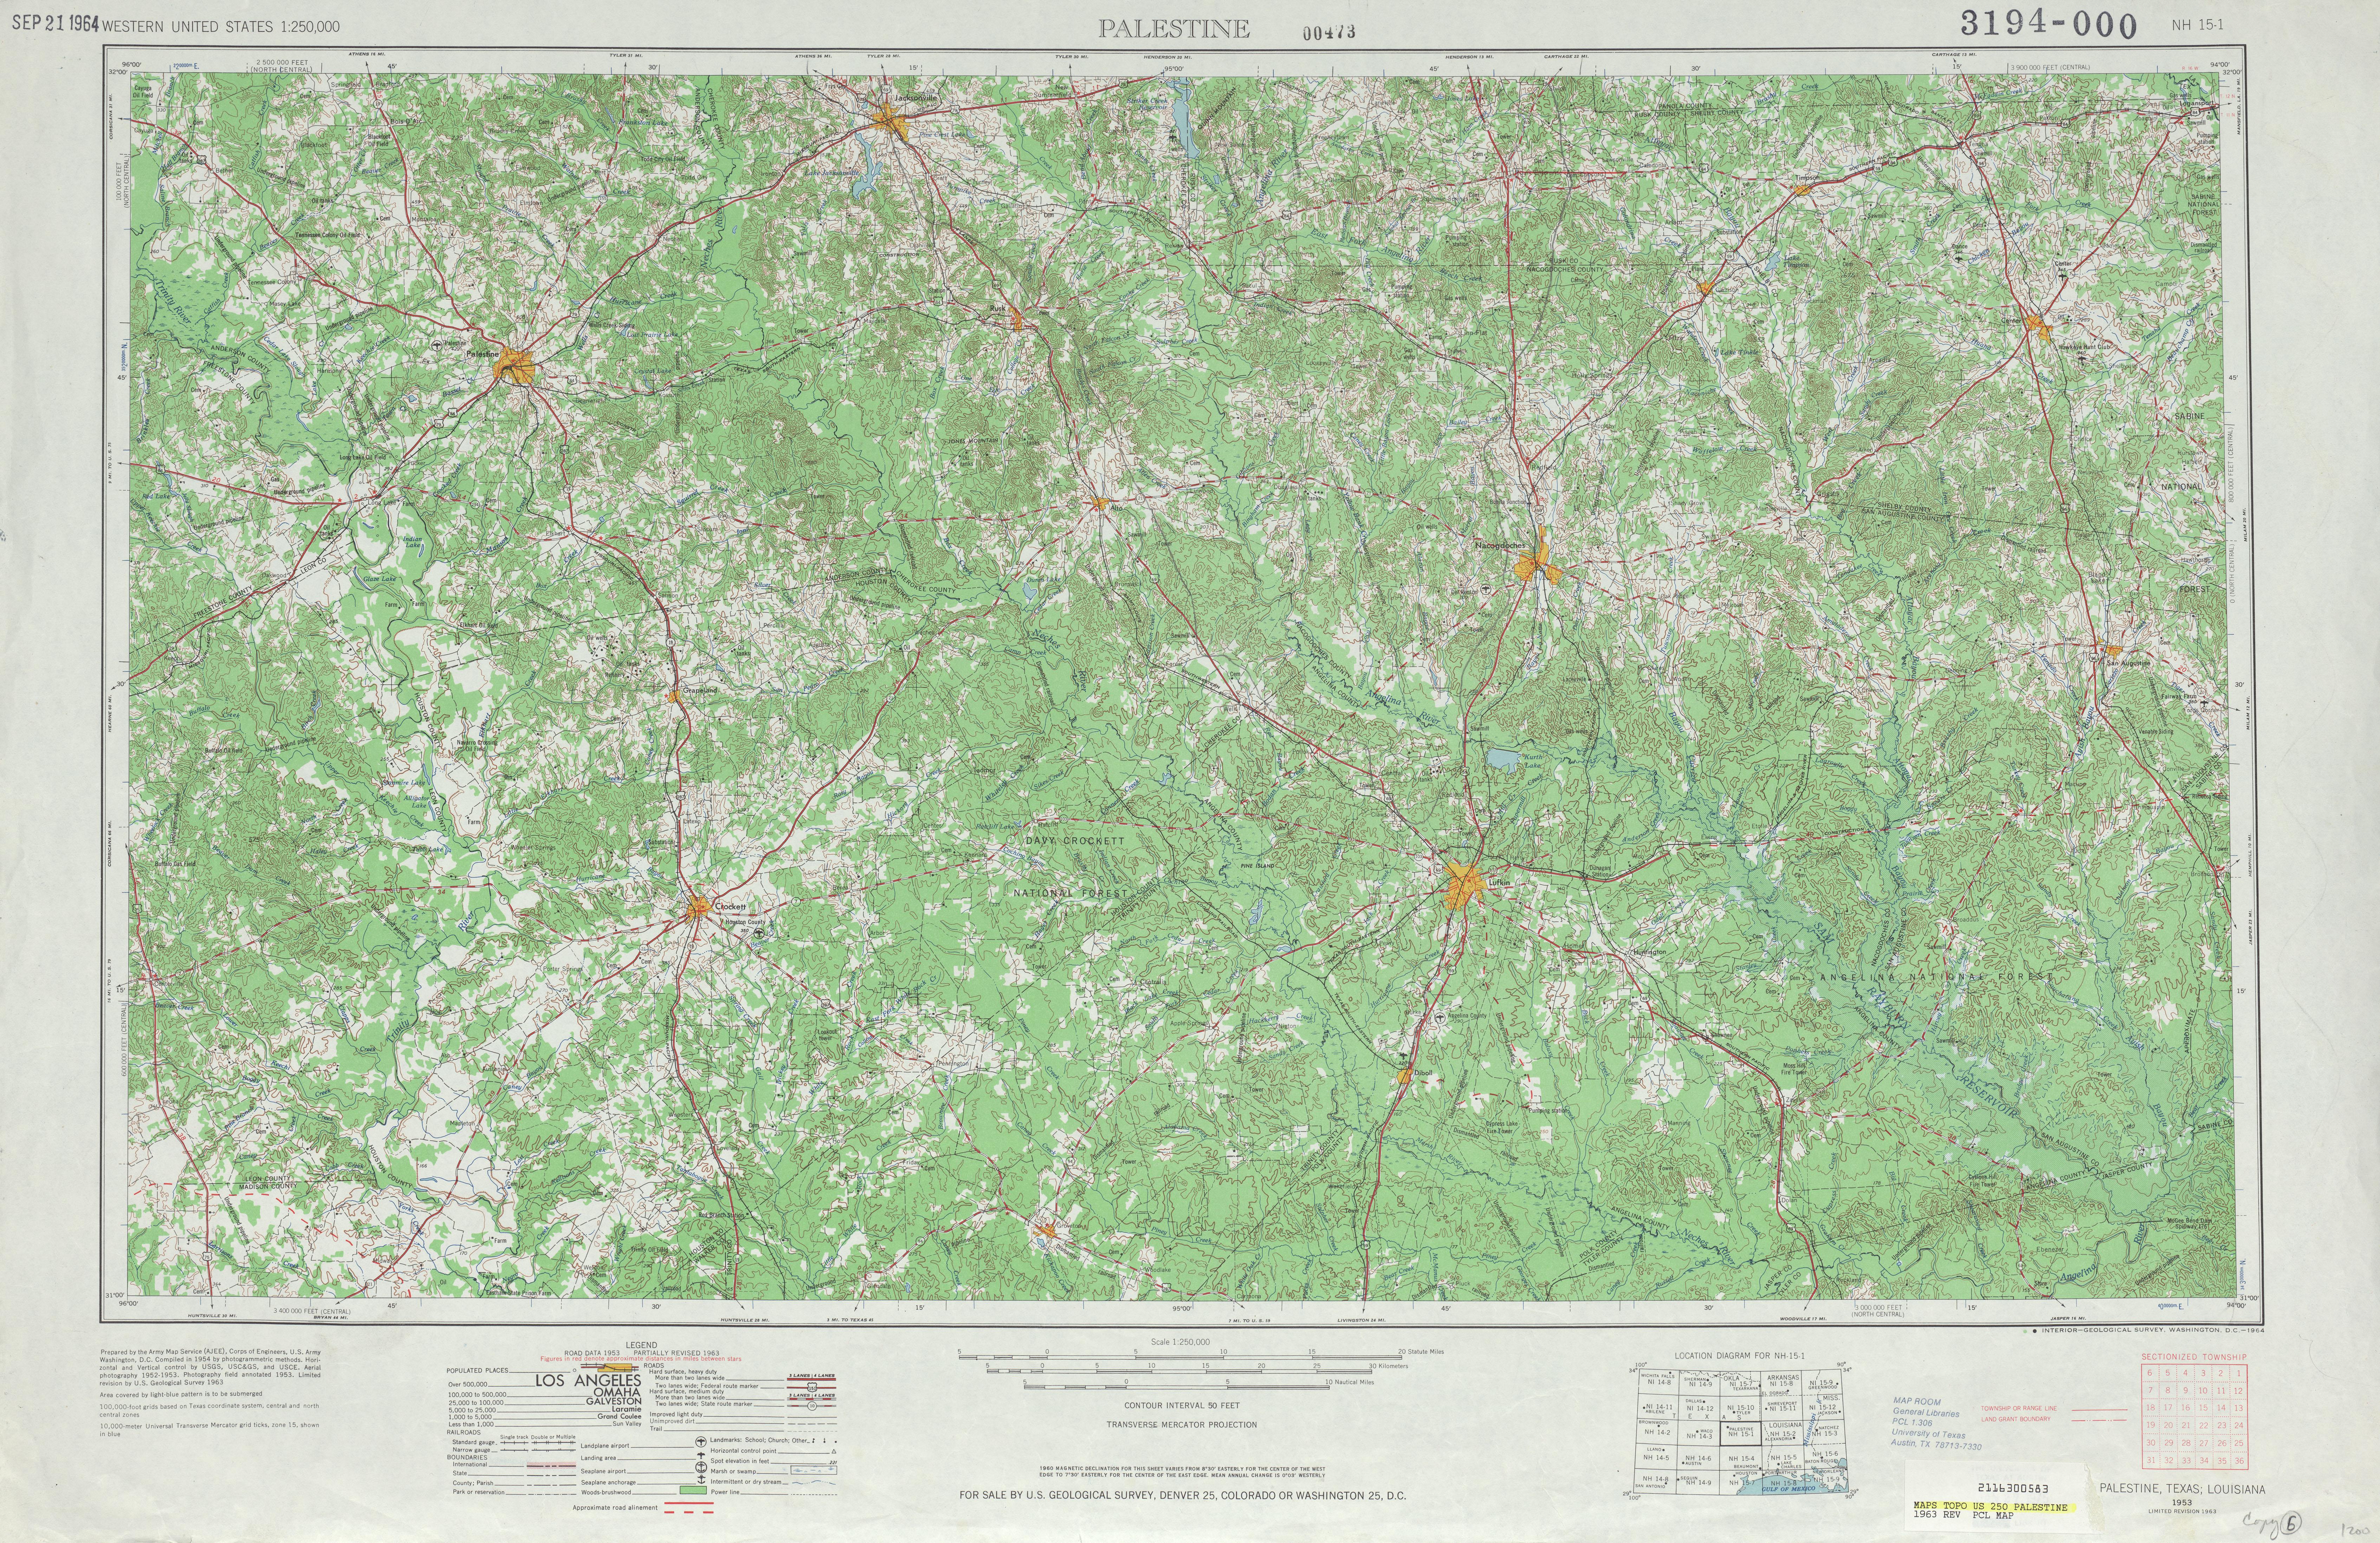 Palestine Topographic Map Sheet, United States 1963